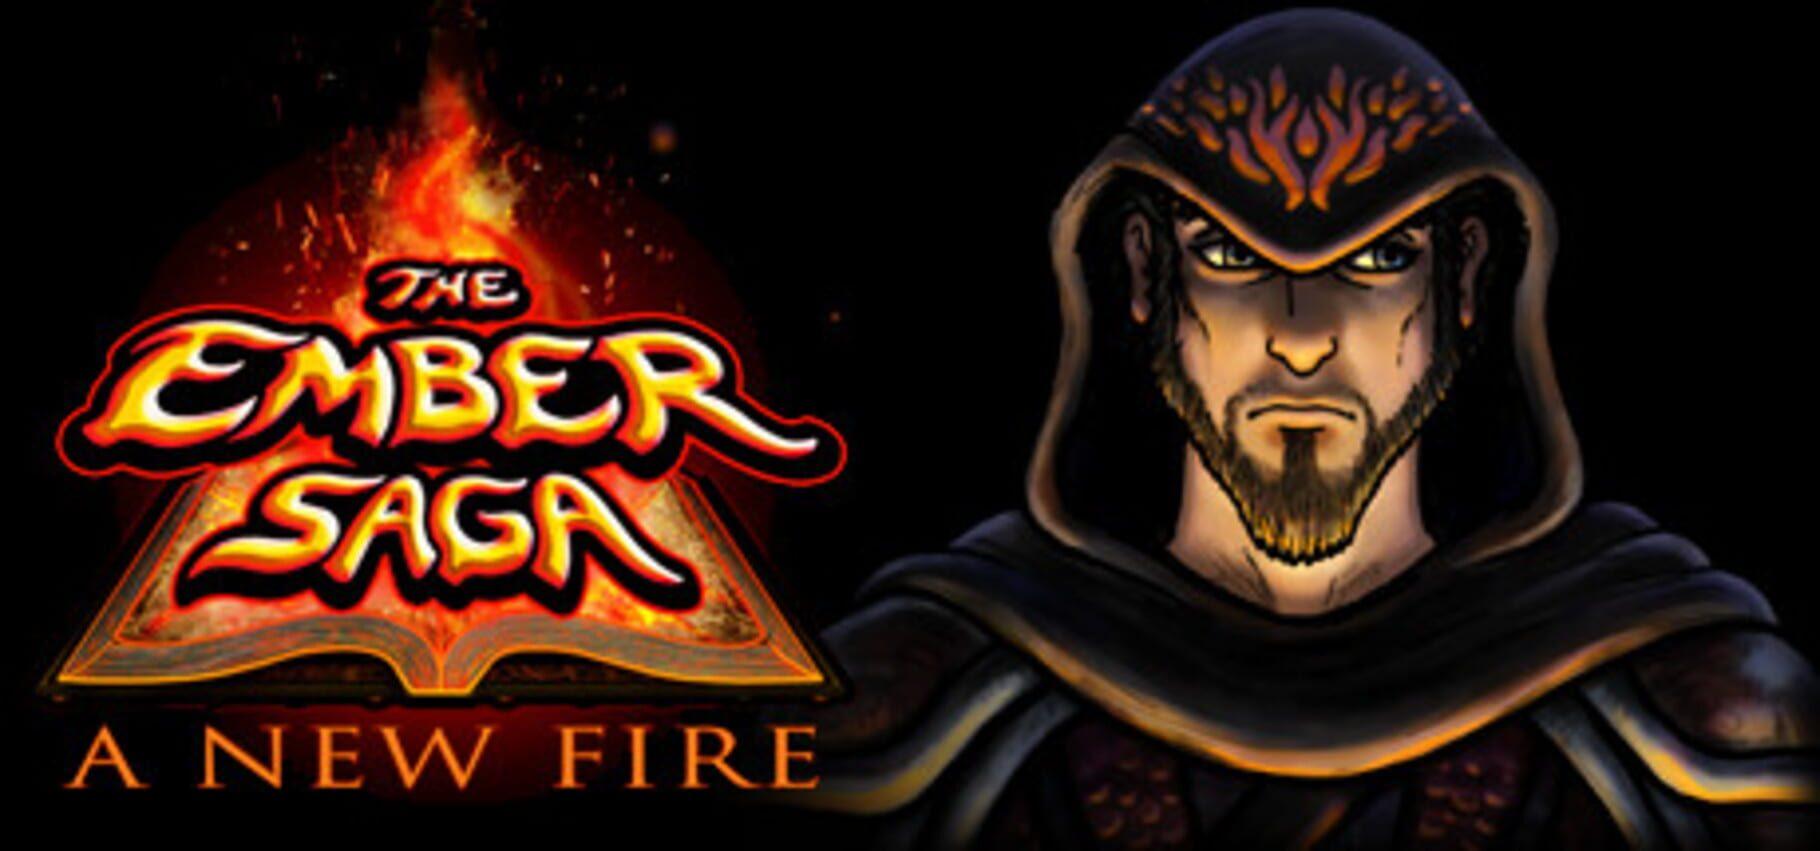 buy The Ember Saga: A New Fire cd key for all platform